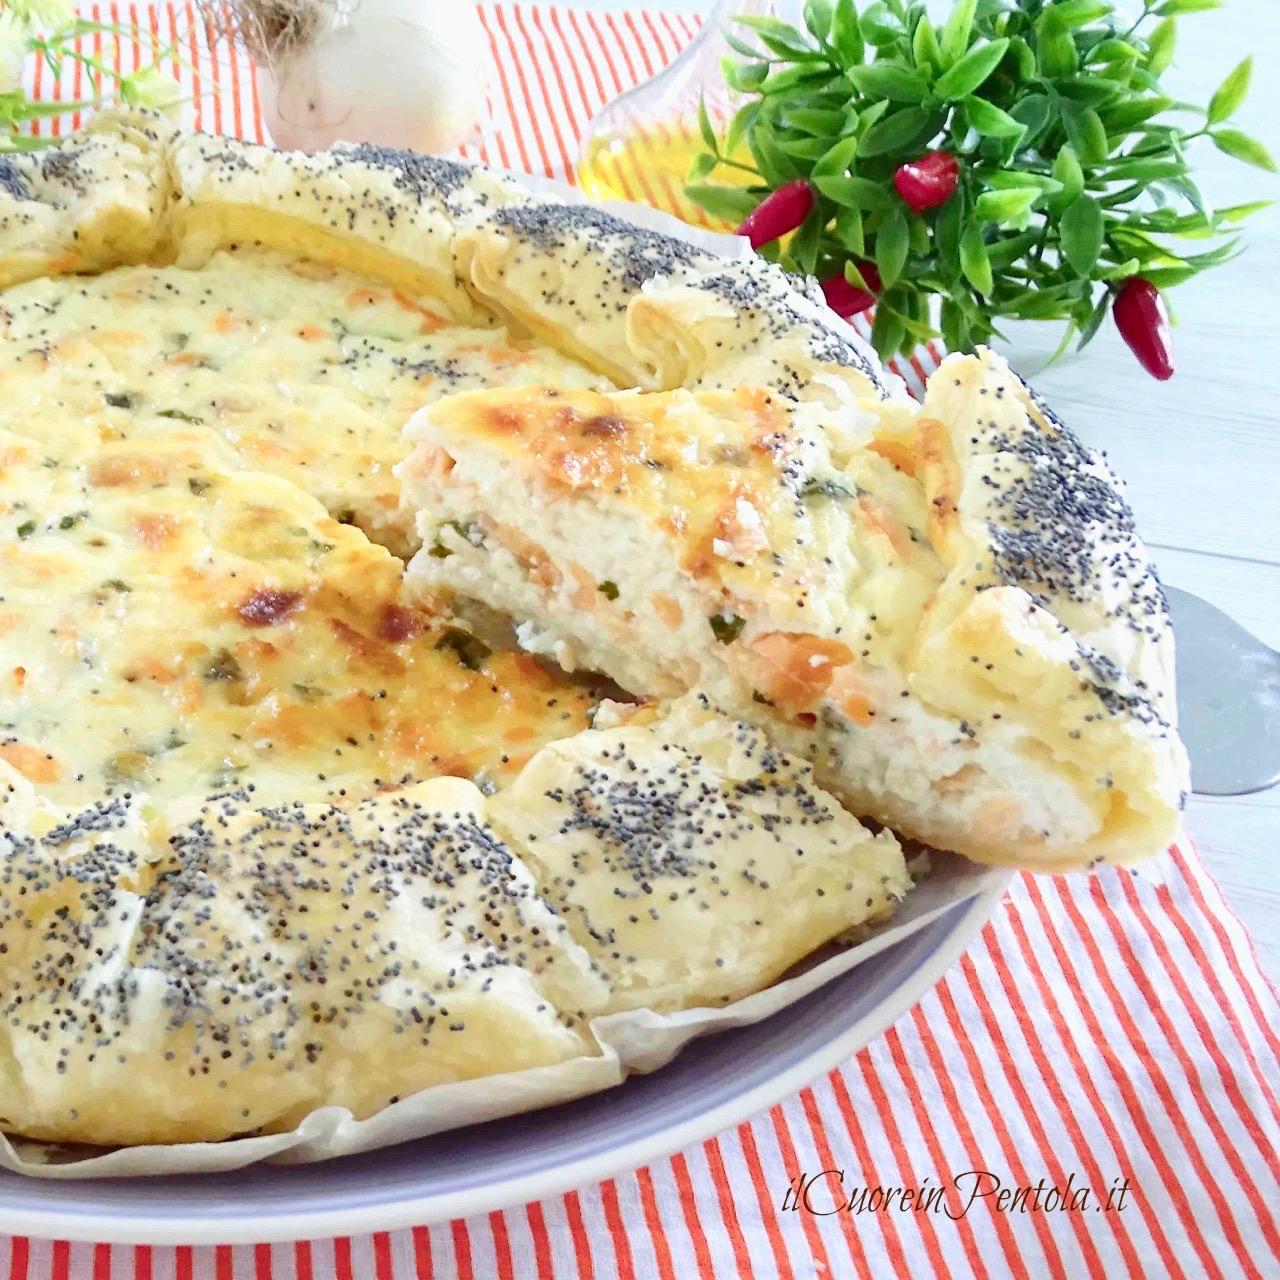 torta salata con salmone e ricotta